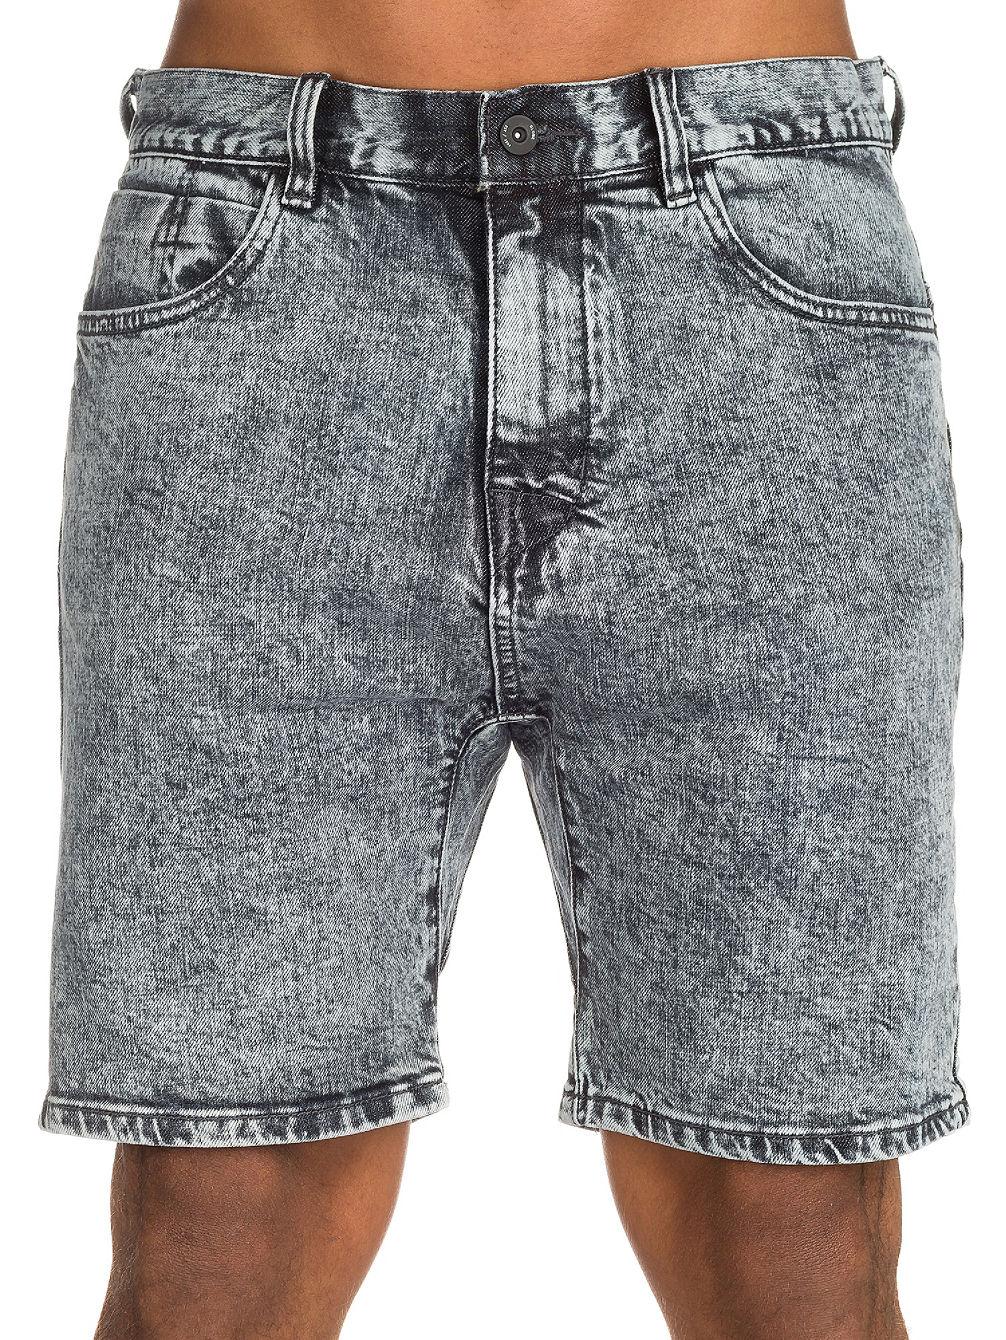 globe-lo-slung-select-denim-shorts